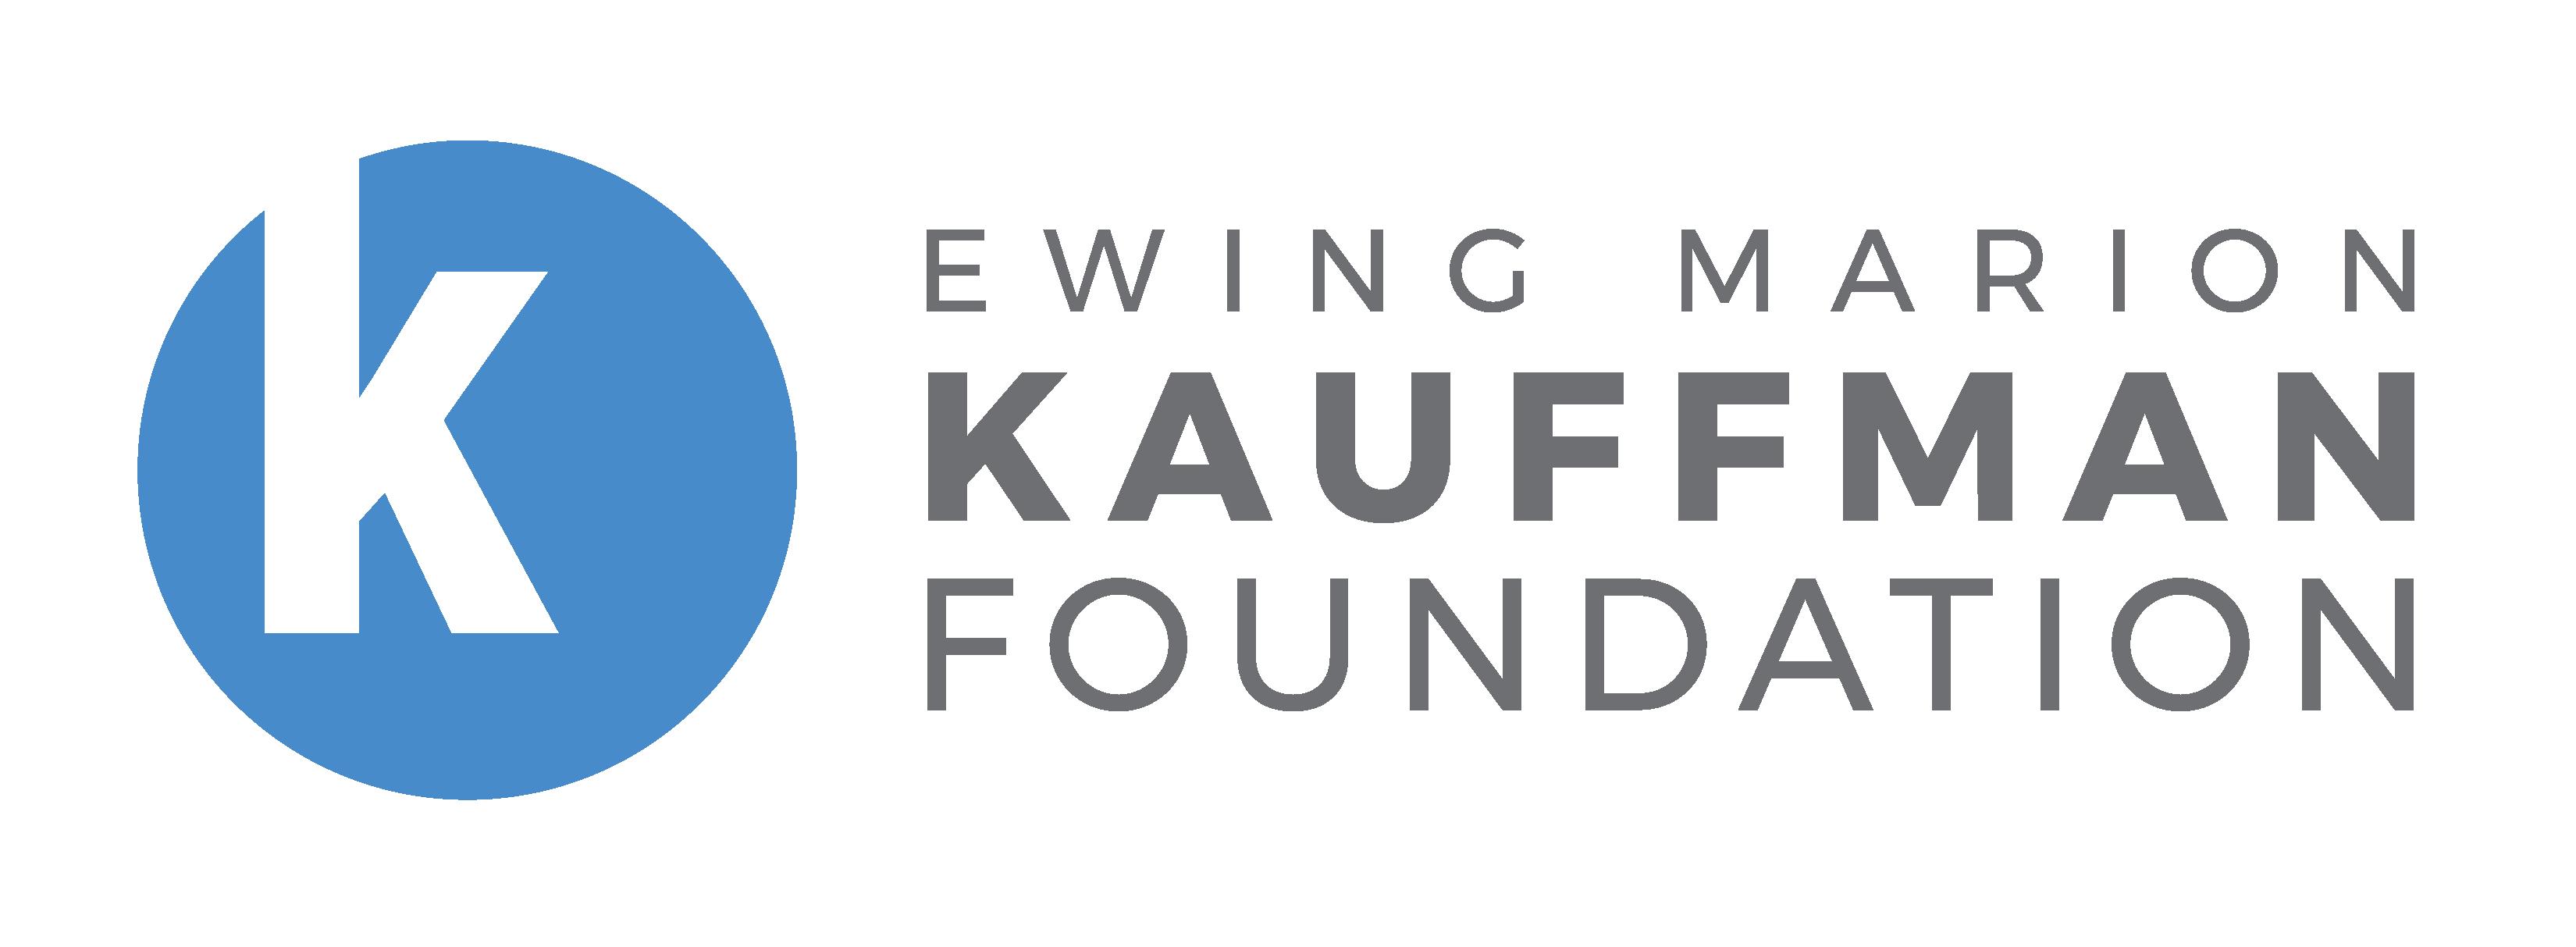 emkf logo